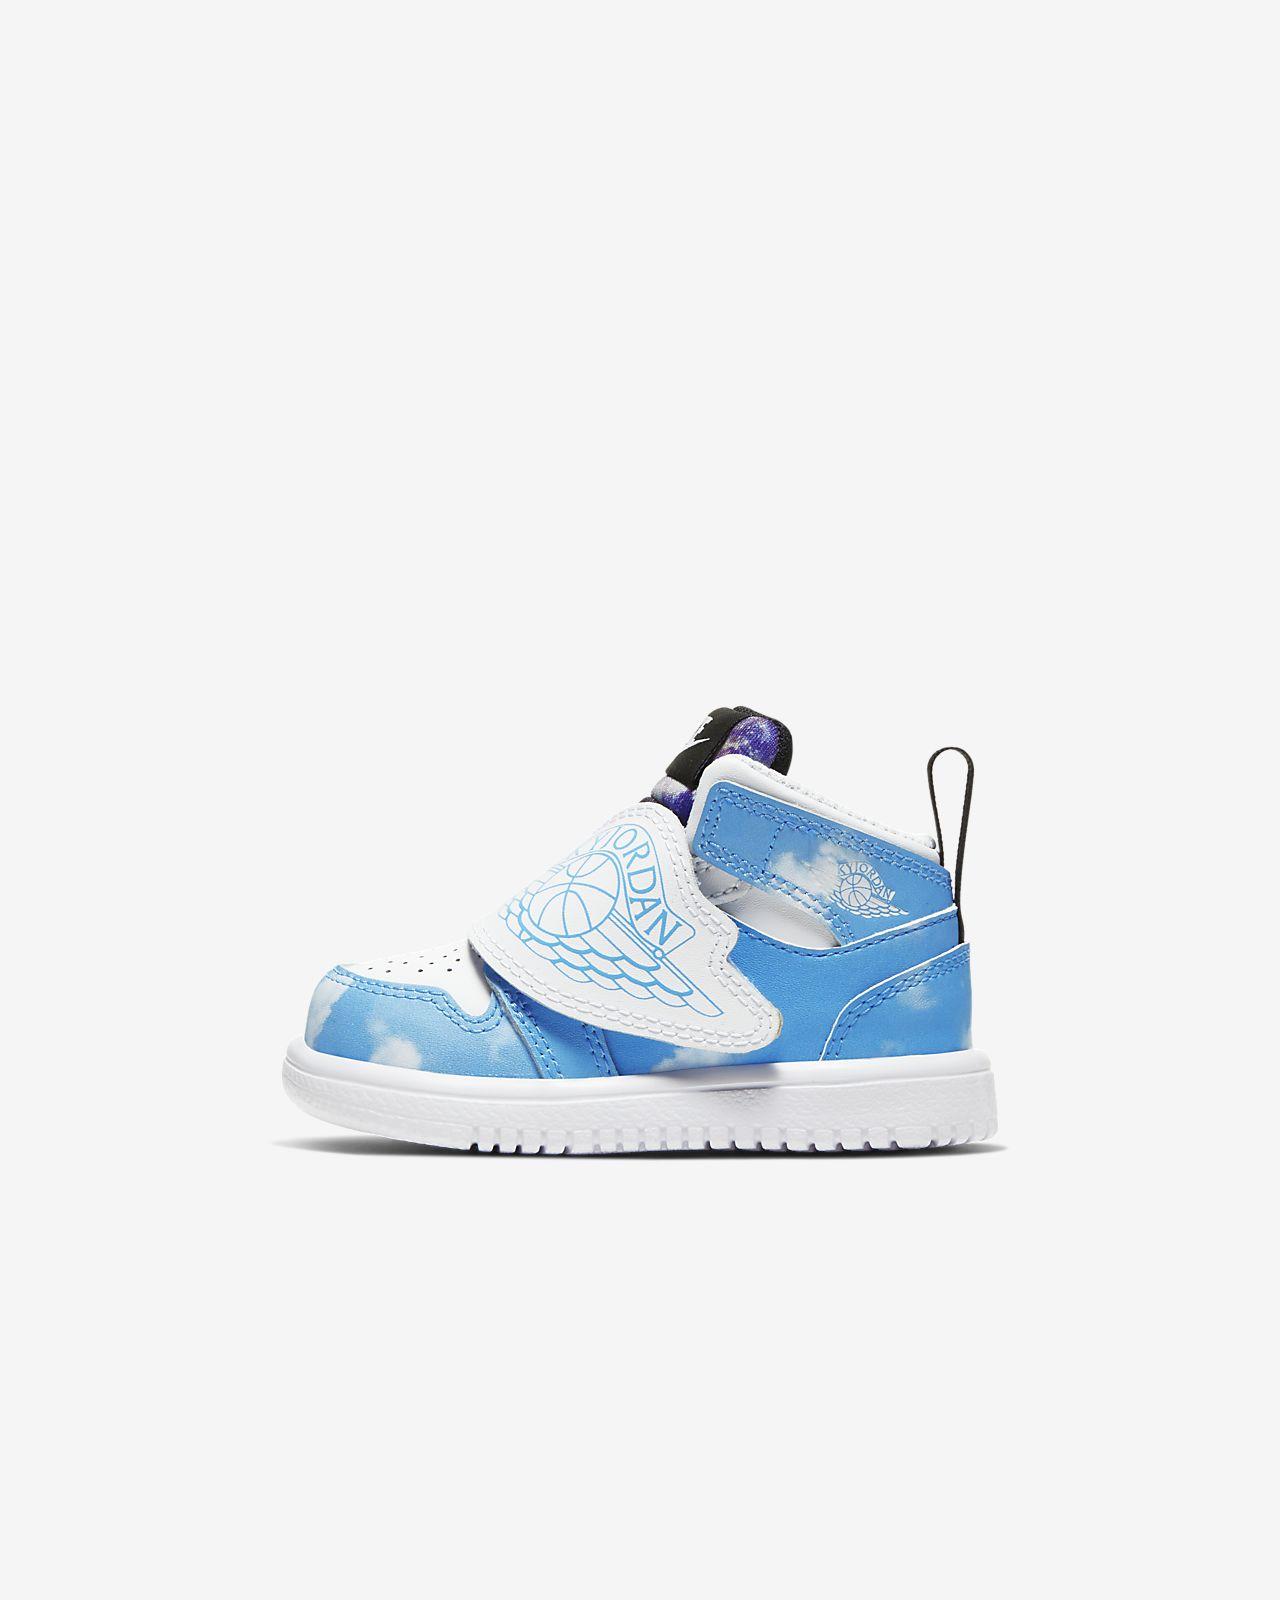 Sky Jordan 1 Fearless Baby/Toddler Shoe